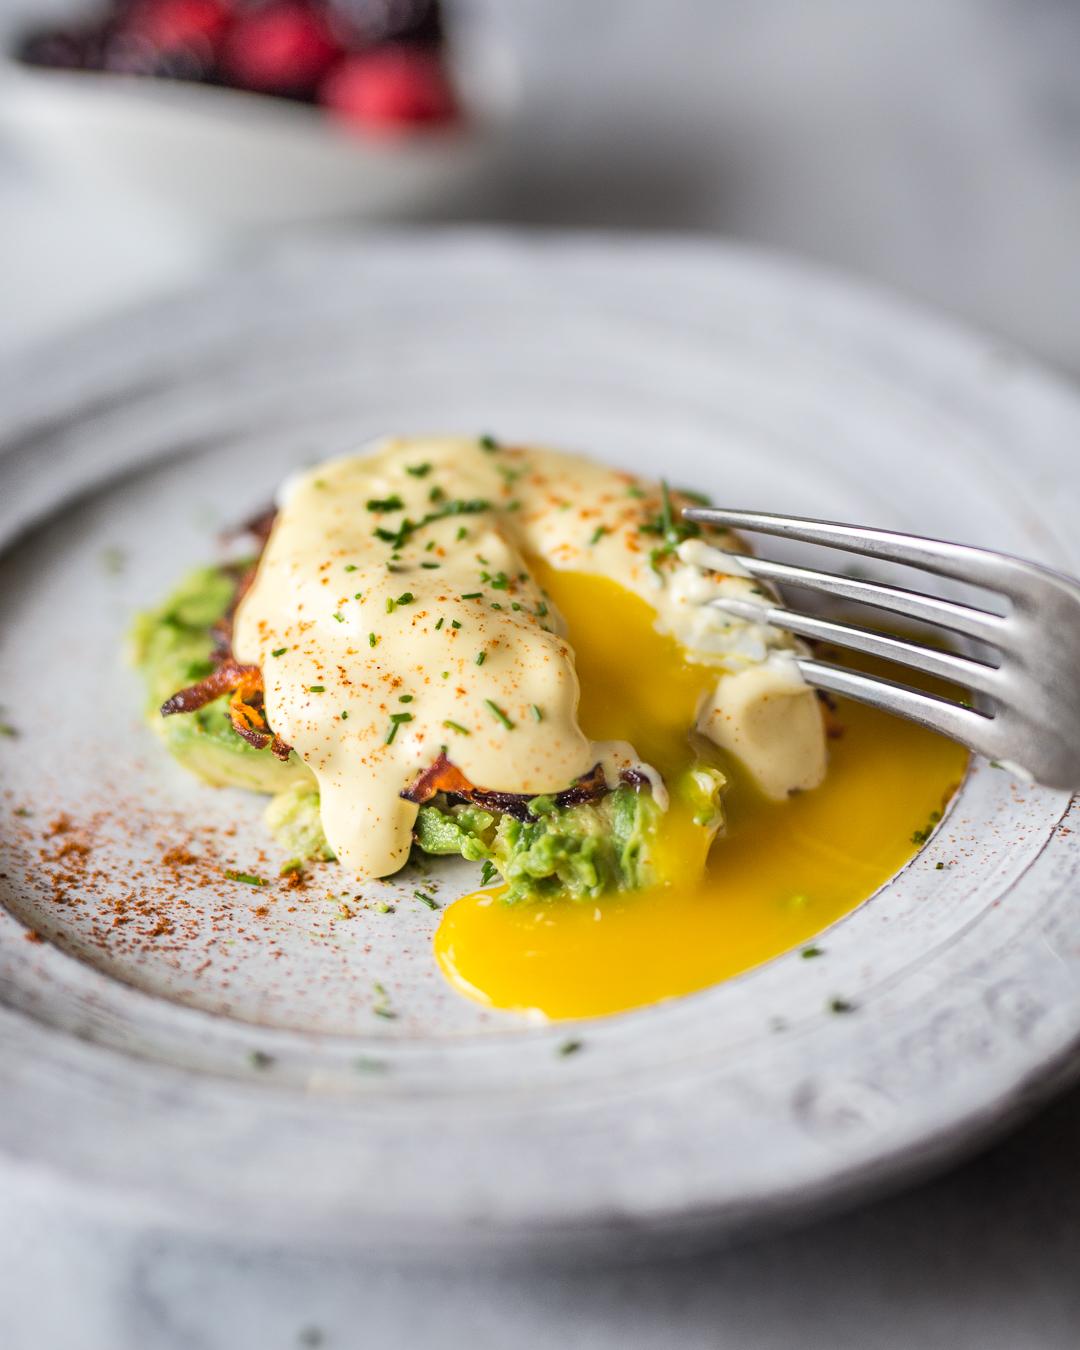 Paleo Eggs Benedict Whole 30 Primal Gourmet Easy Fool Proof Hollandaise